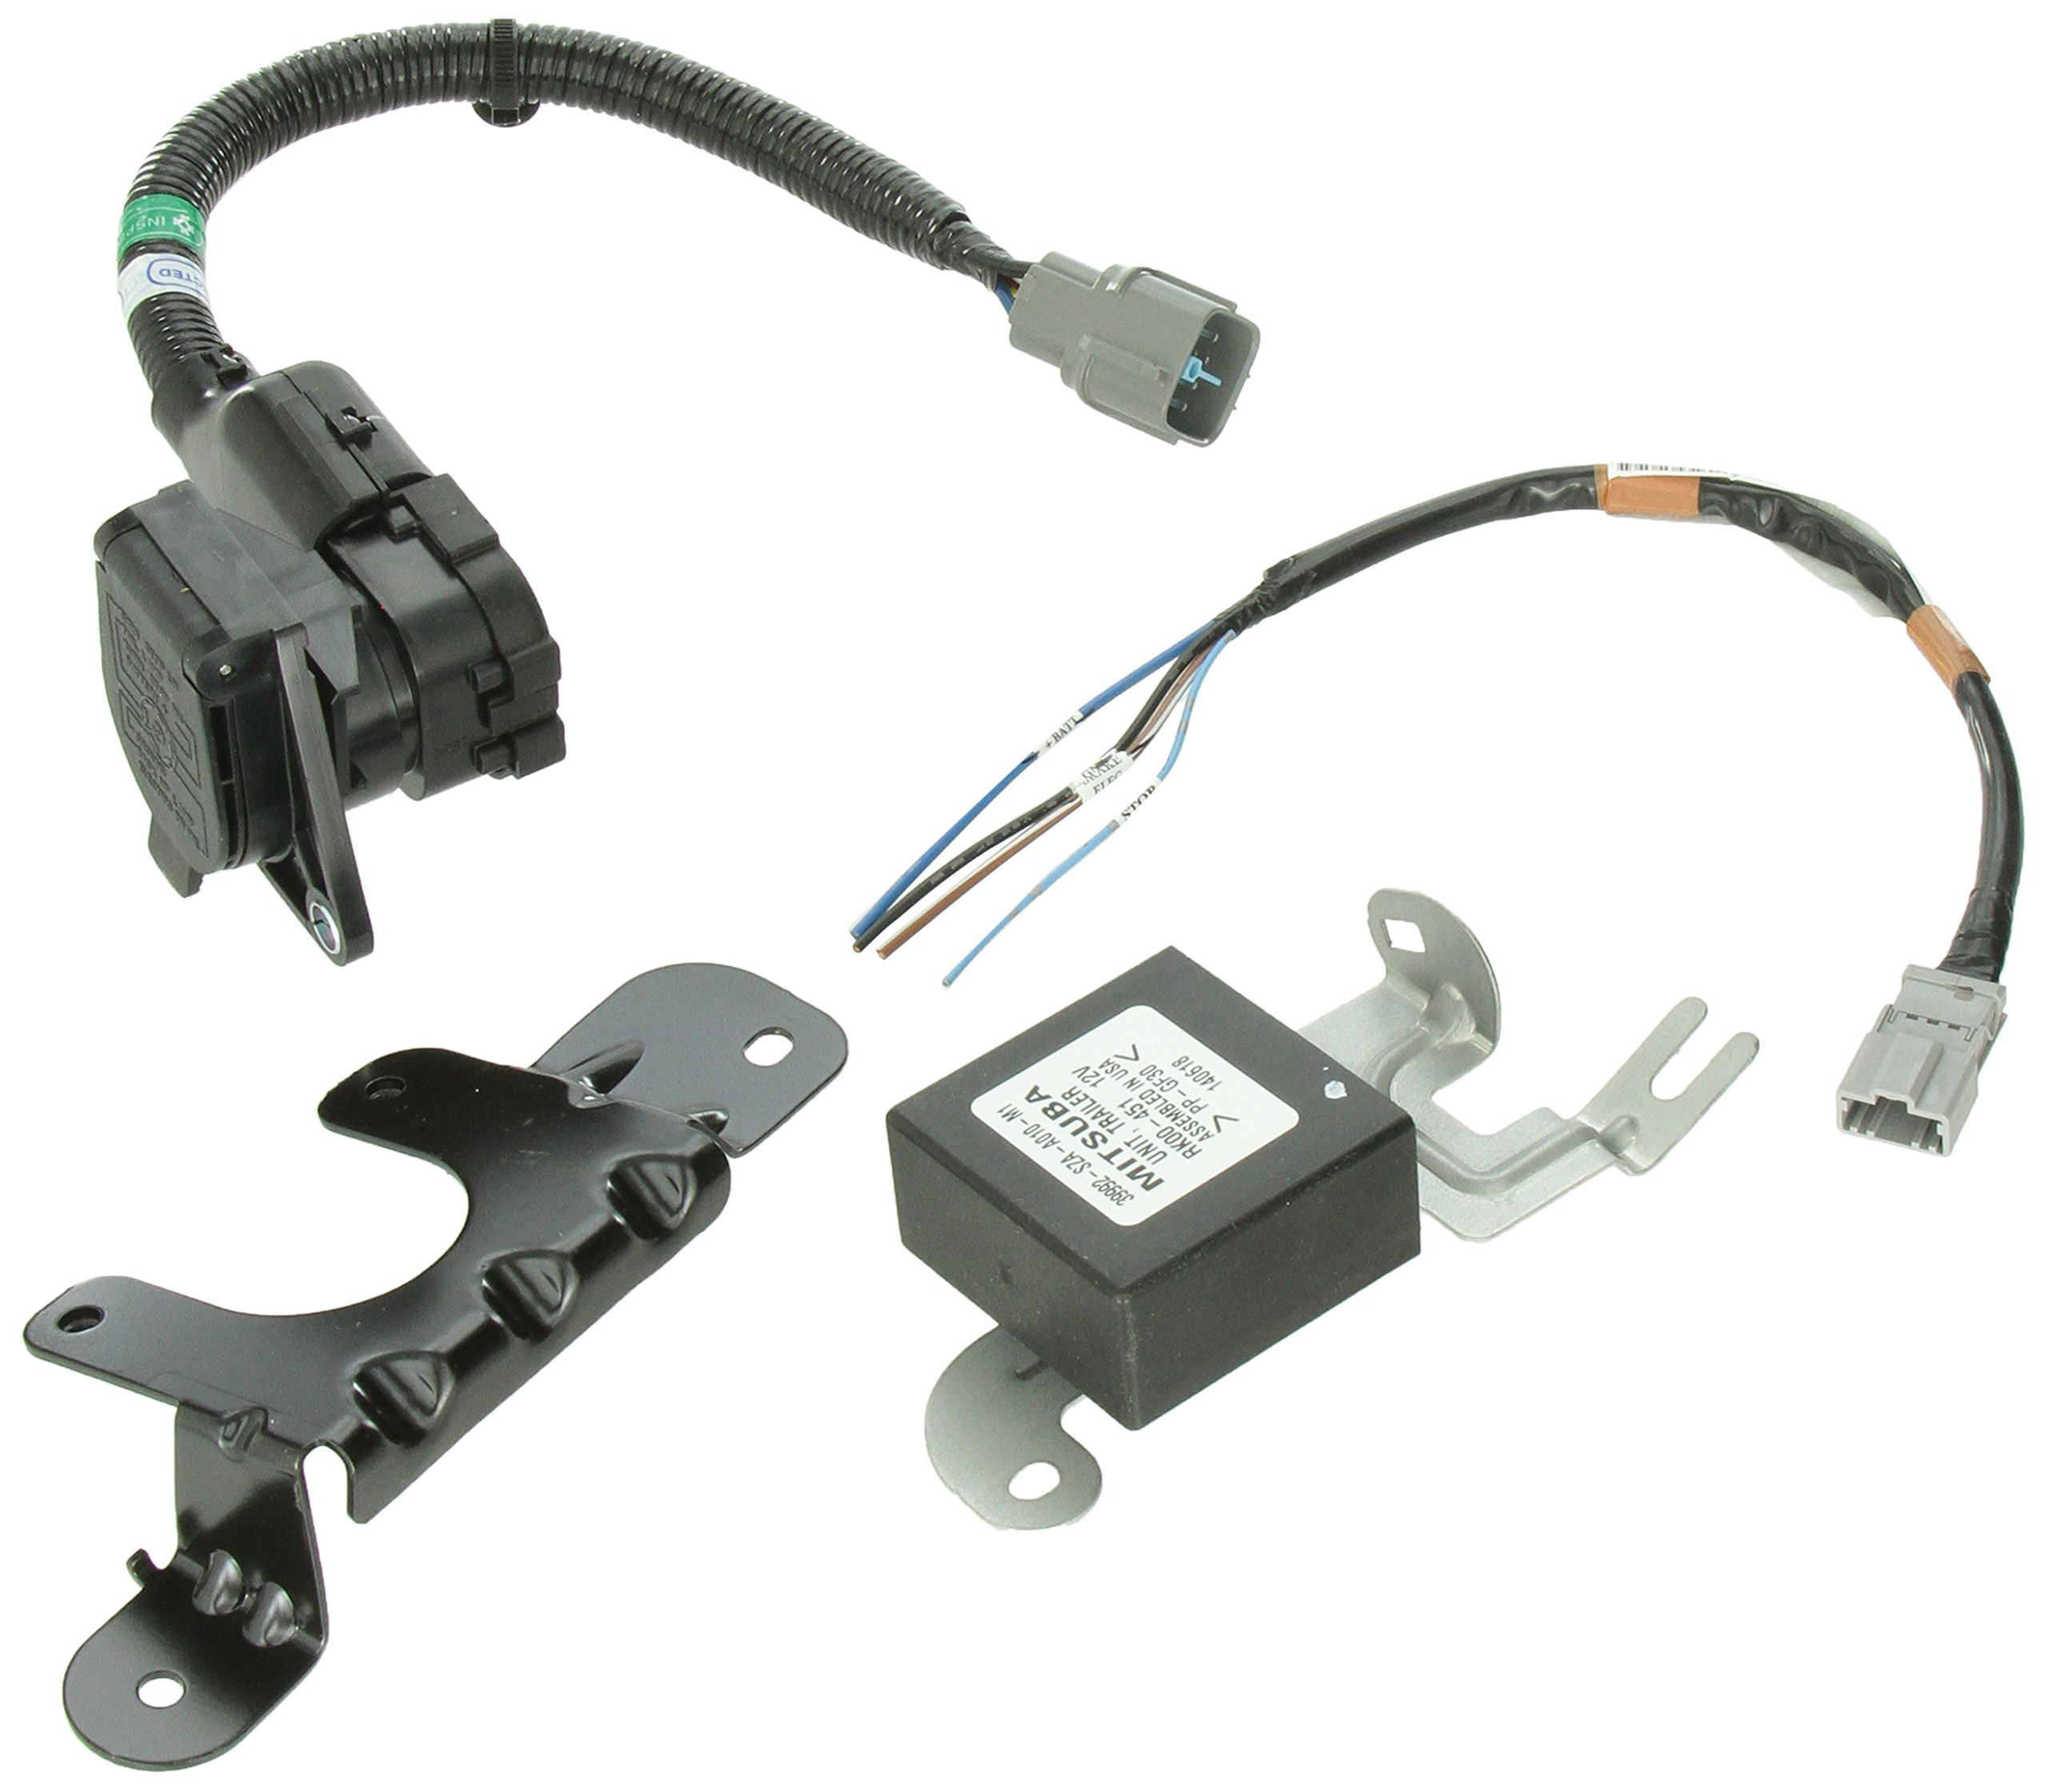 Honda Genuine 08L91-SZA-100 Trailer Hitch Harness